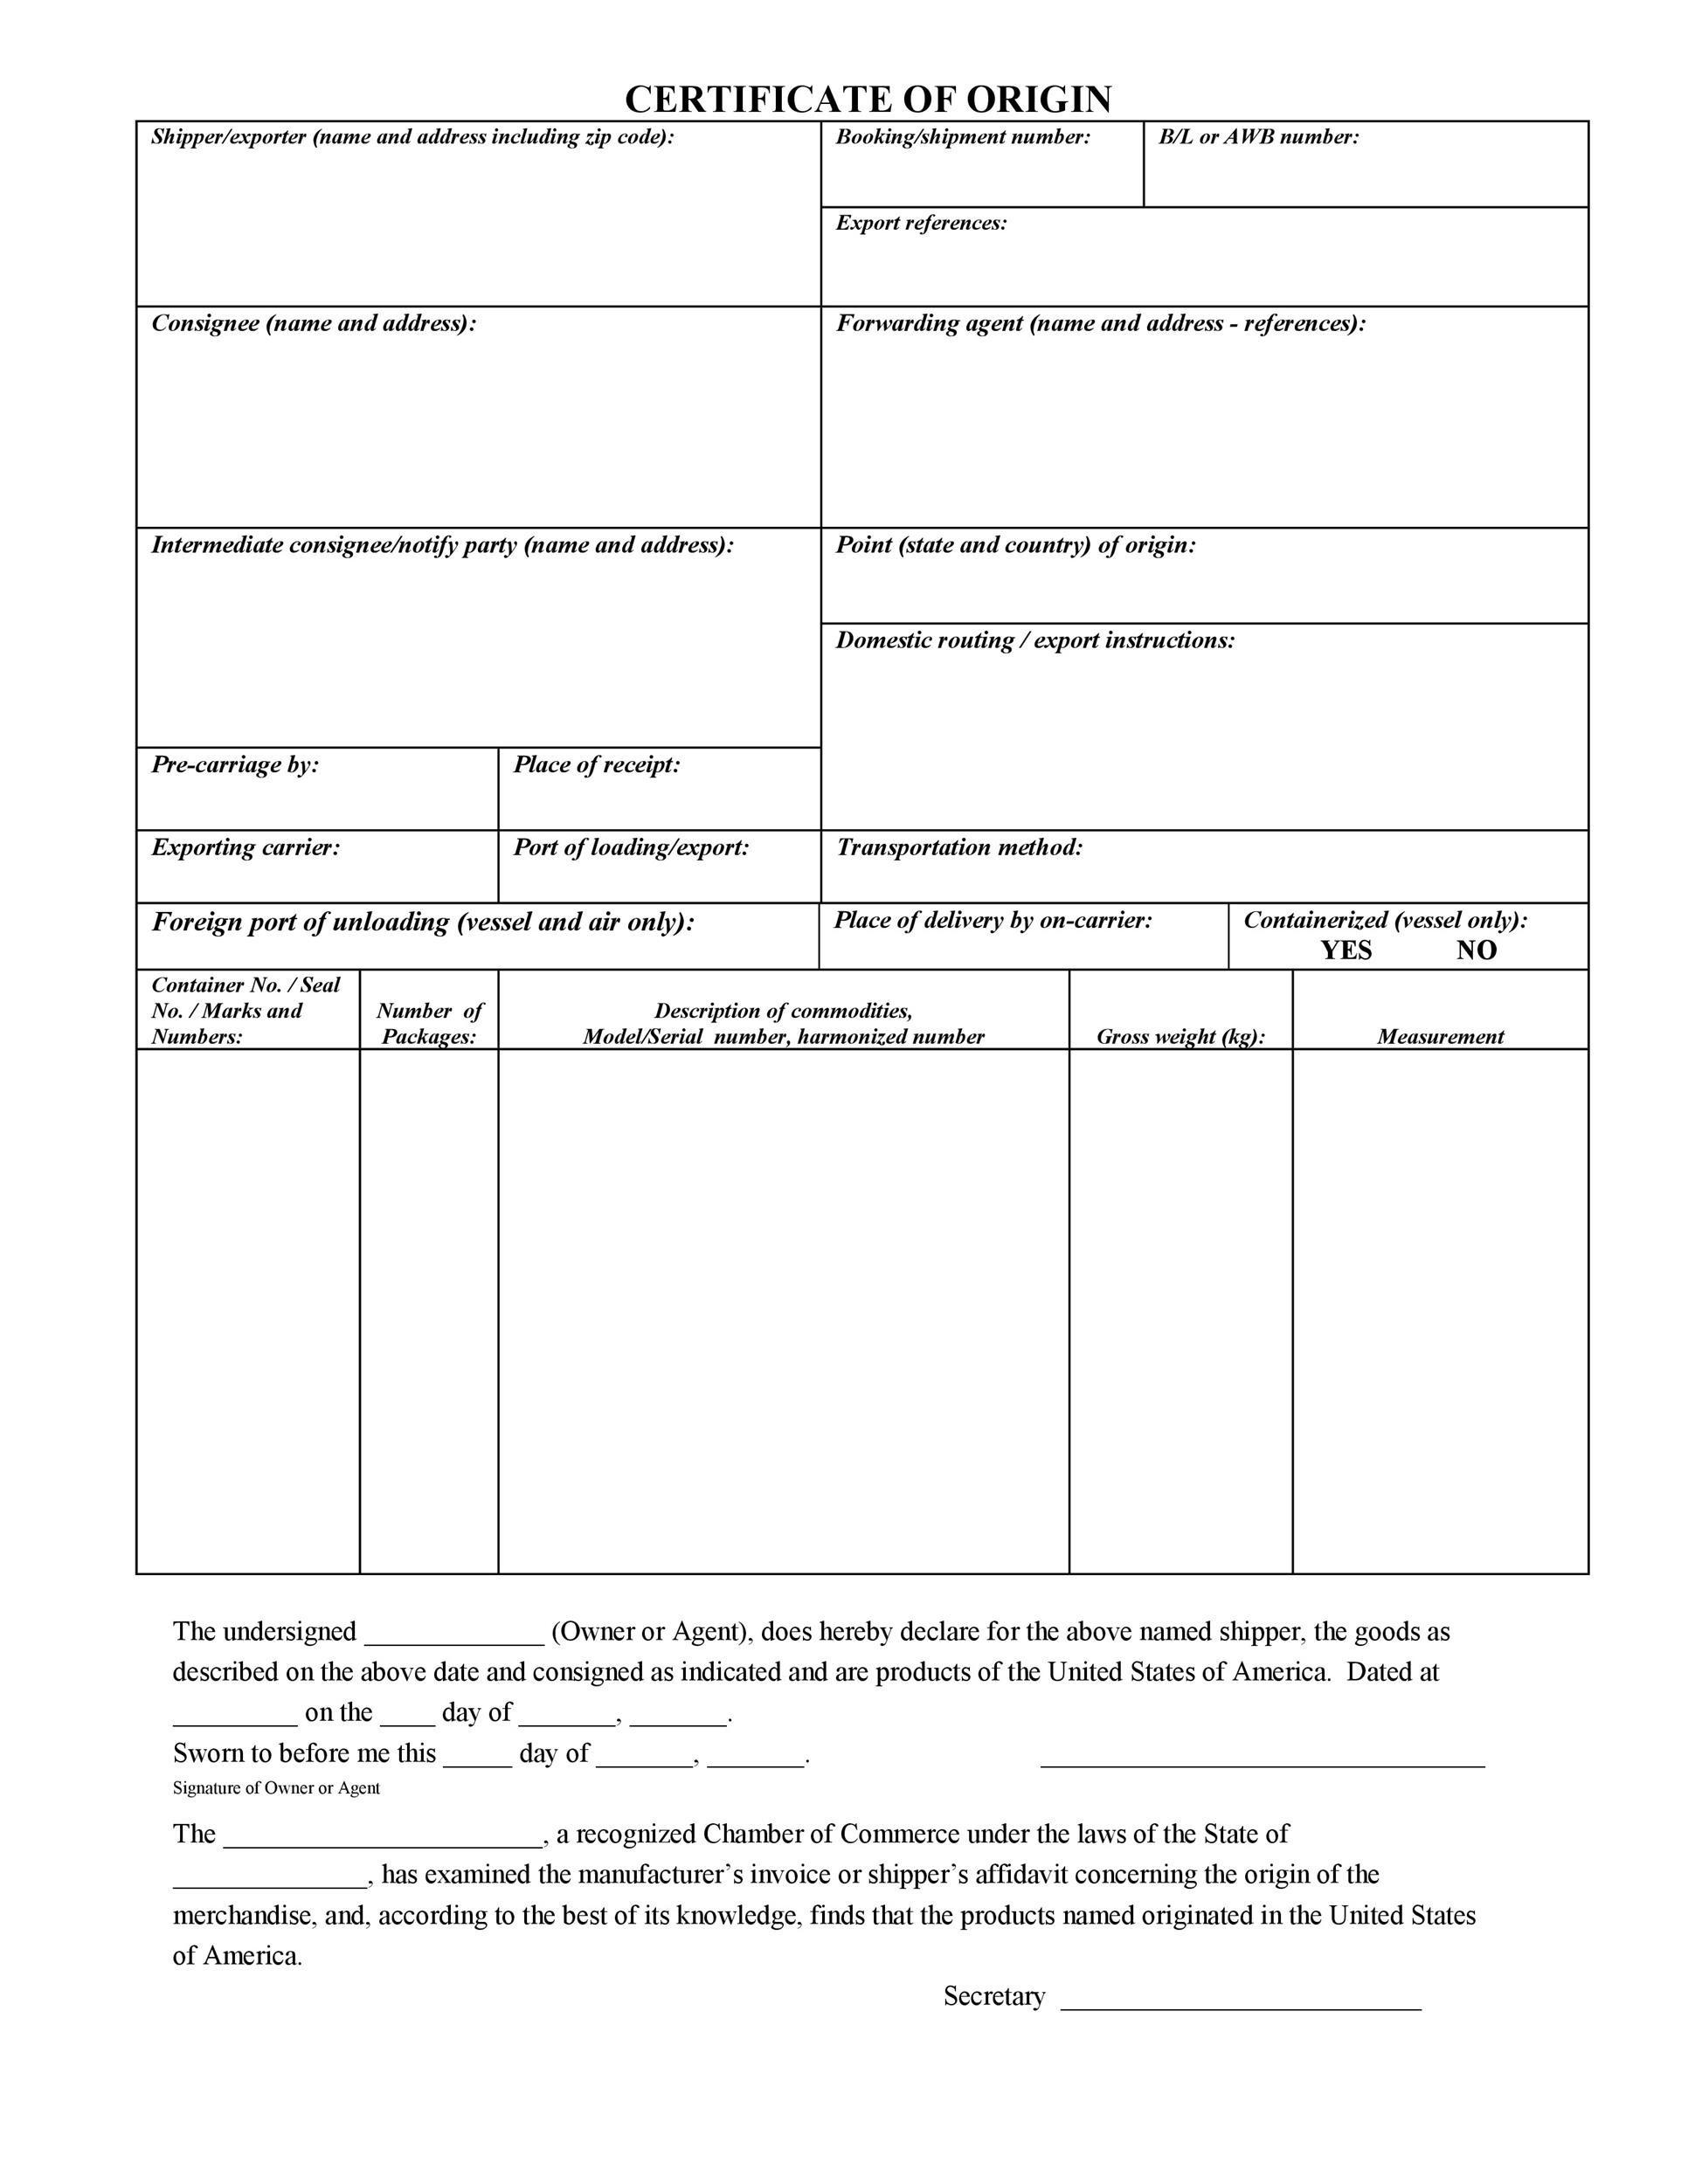 Free certificate of origin 28